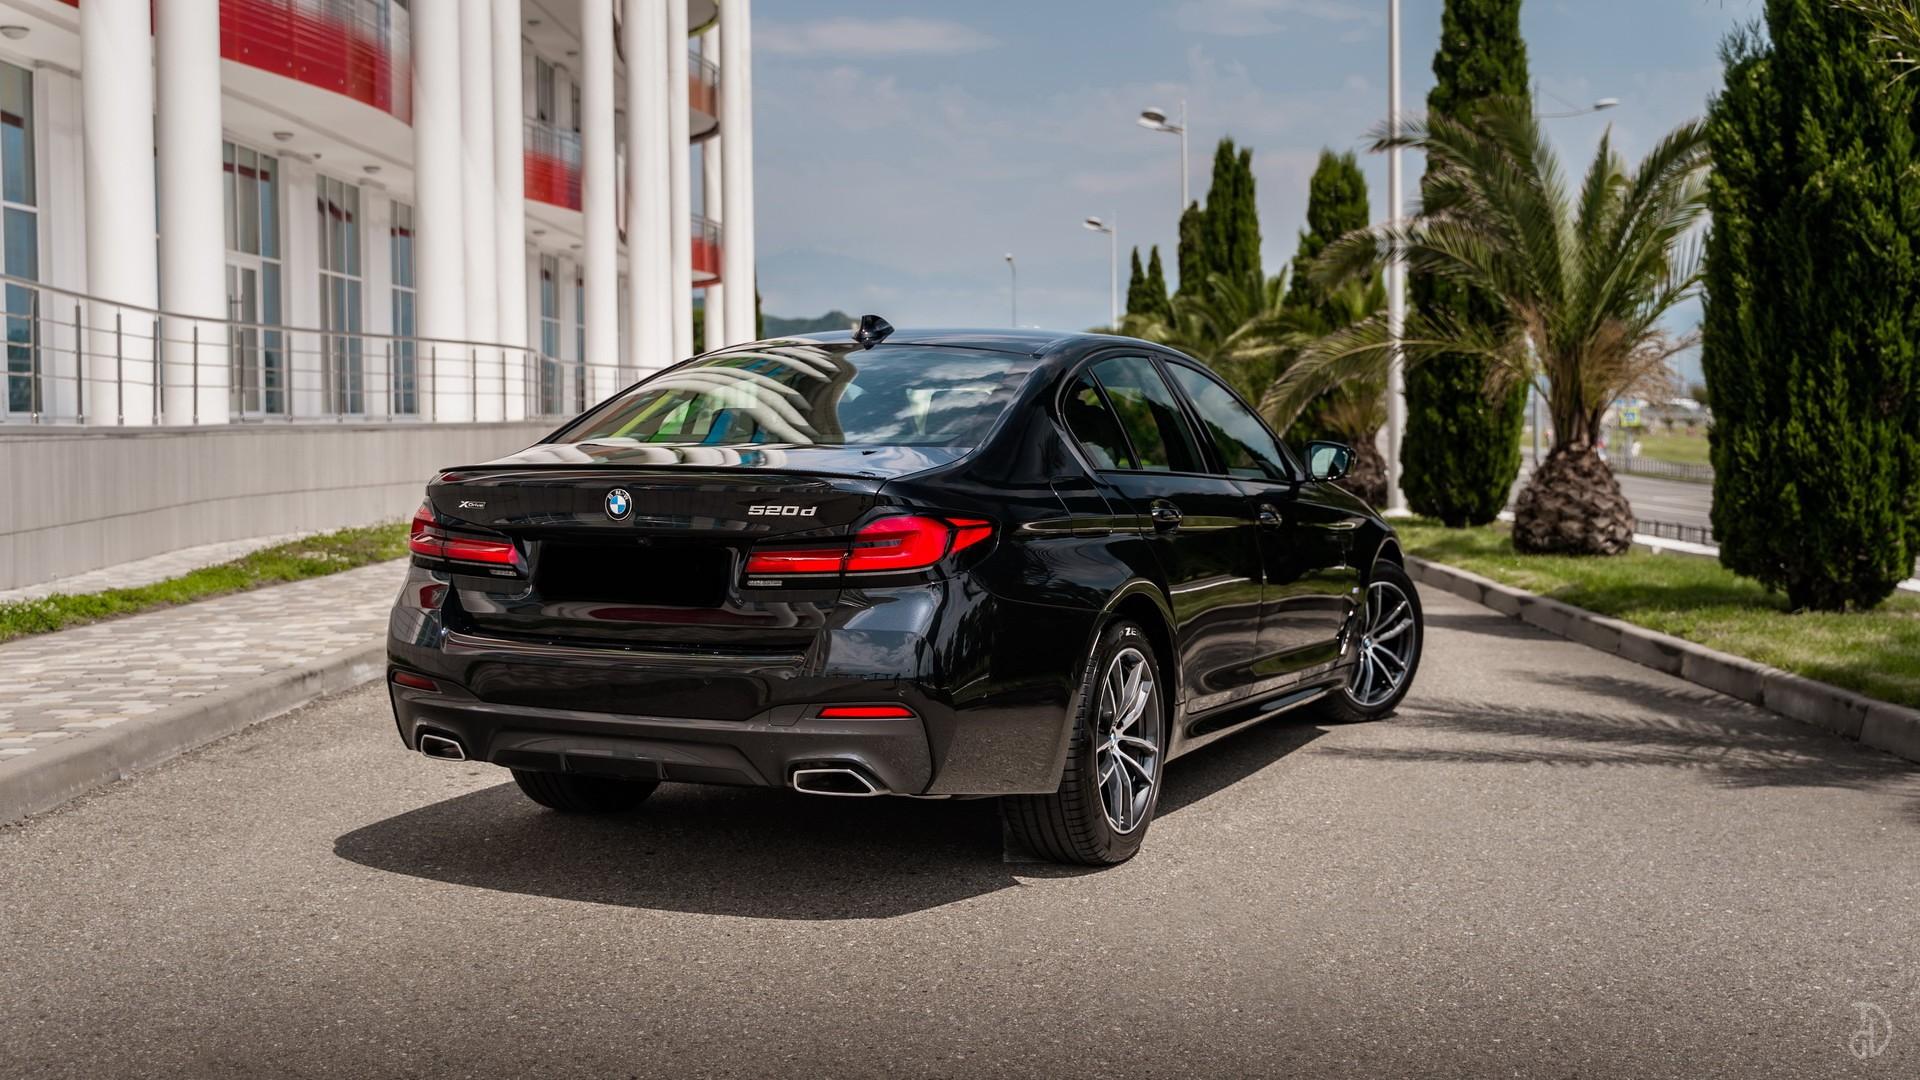 Аренда BMW 520d G30 в Сочи. Фото 5